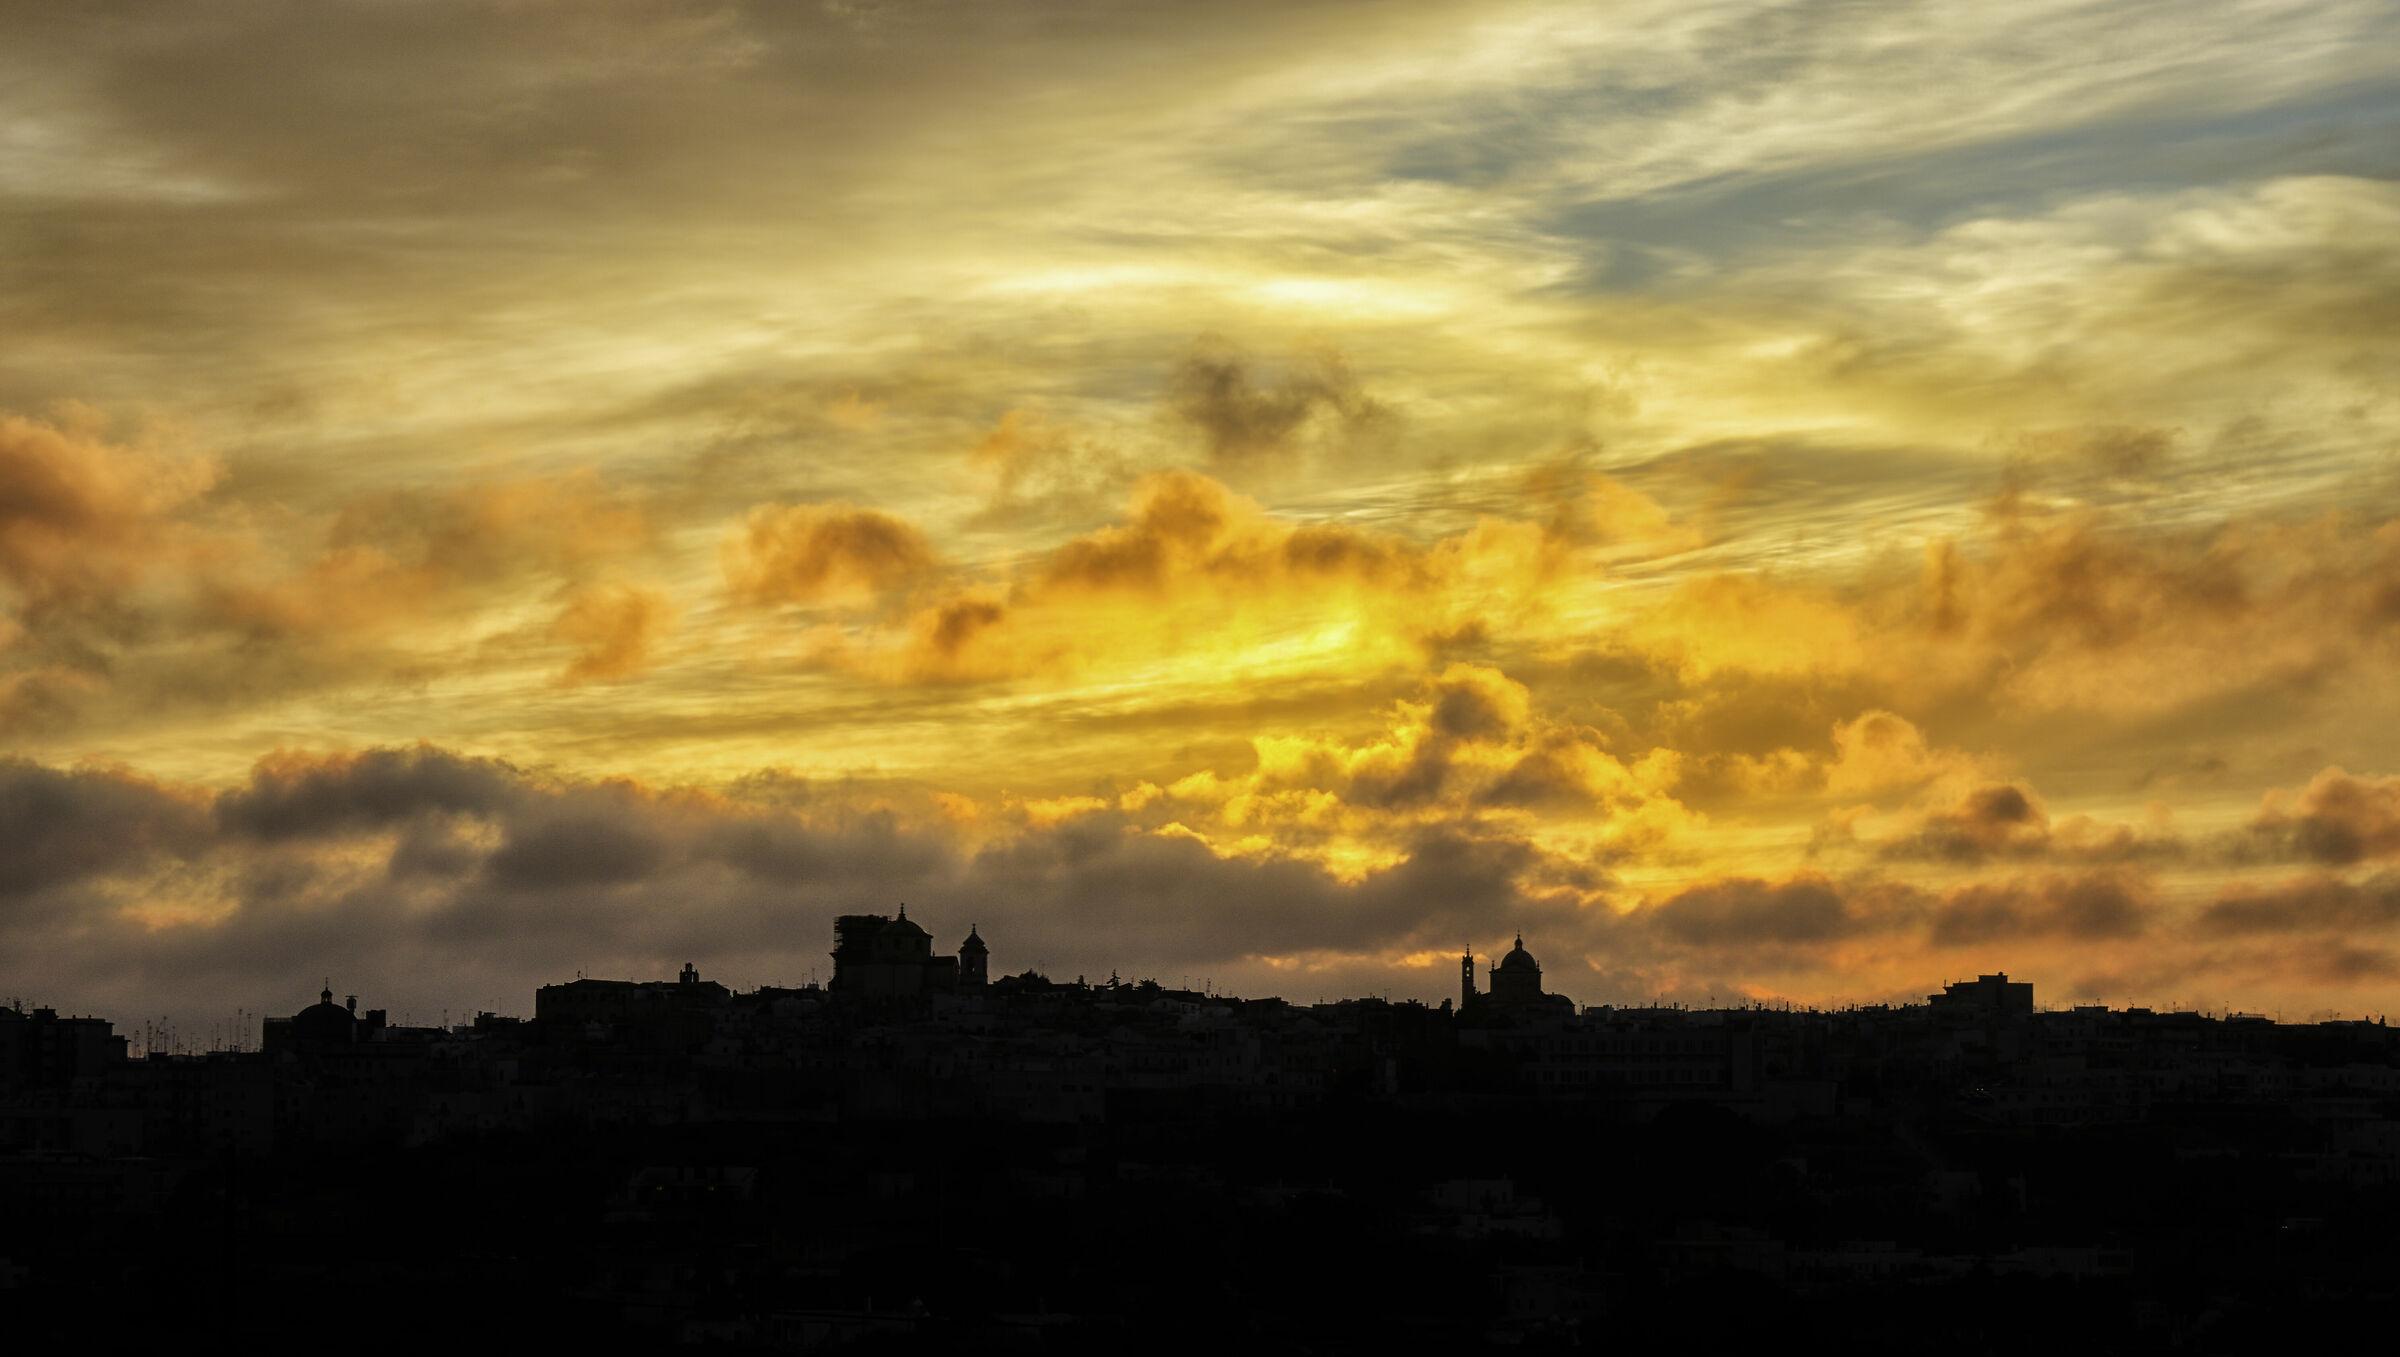 Skyline Ceglie Messapica at sunset ...